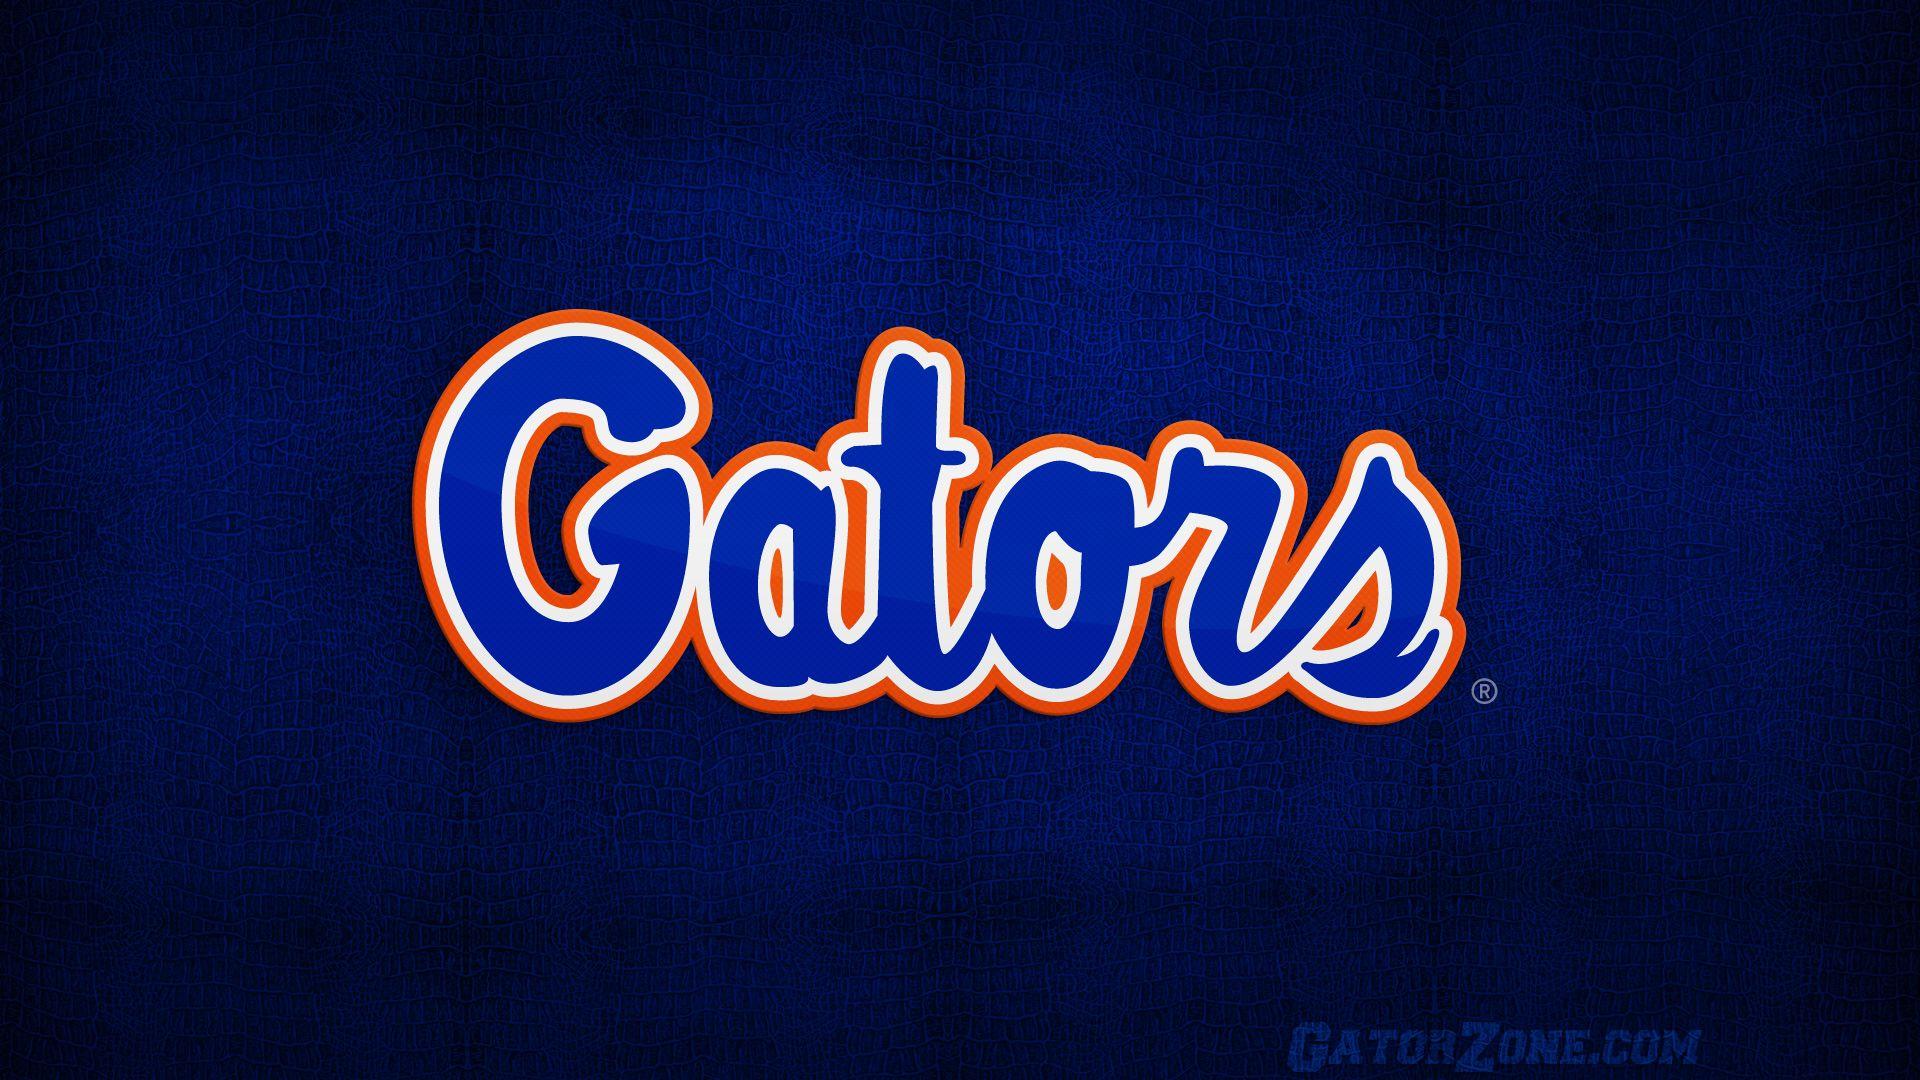 Gator Desktop Wallpaper Florida Gators Wallpaper Florida Gators Football Florida Gators Football Wallpaper